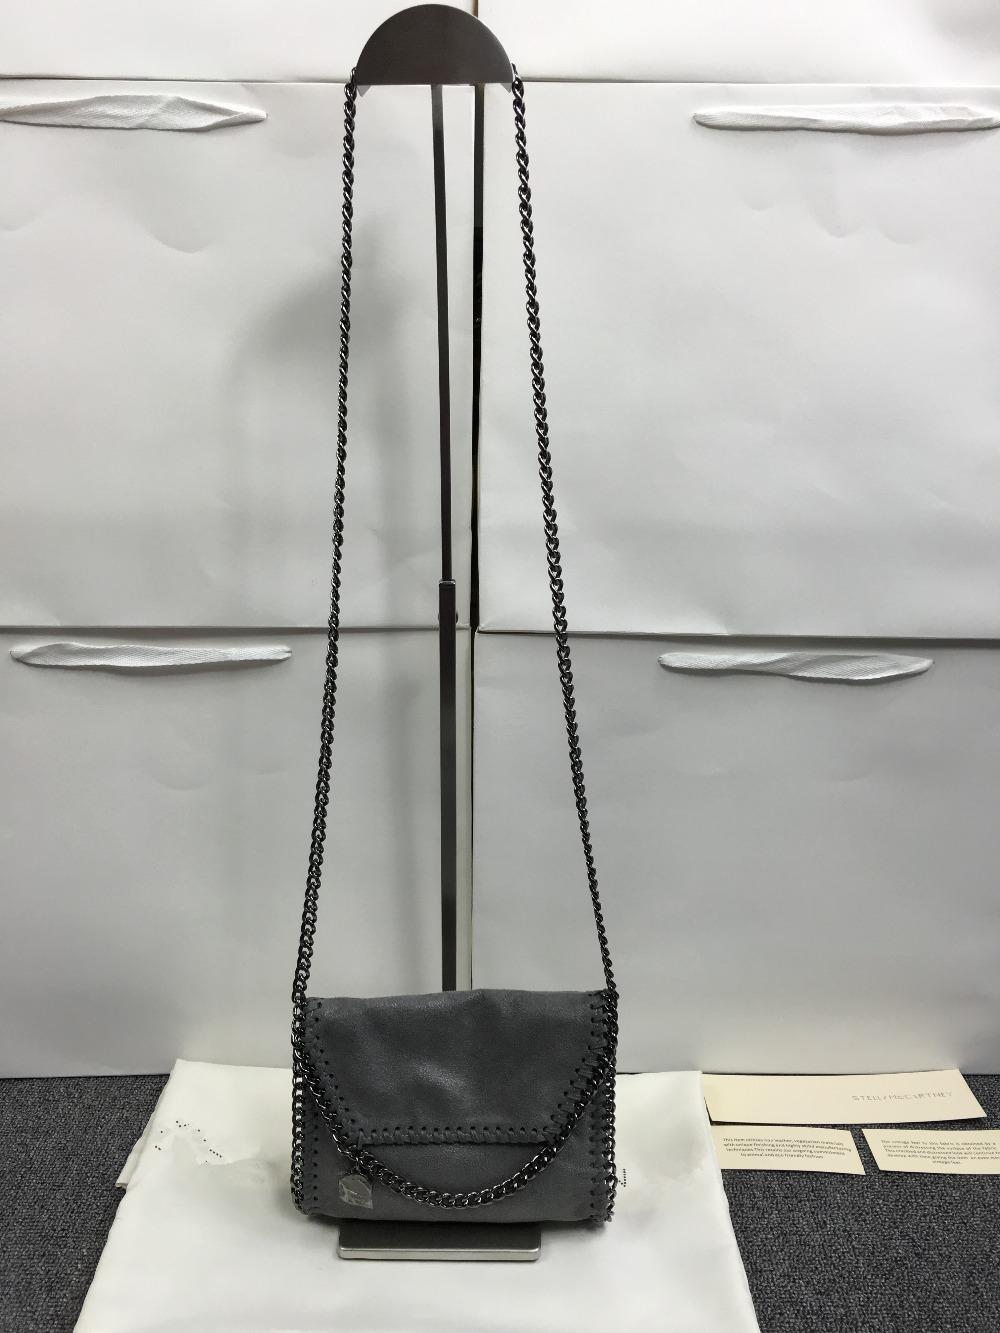 Фотография mini lady bag 2016 NEW  list    CHAIN handbag original material PVC S*T package with logo Shoulder women silver chain  bag